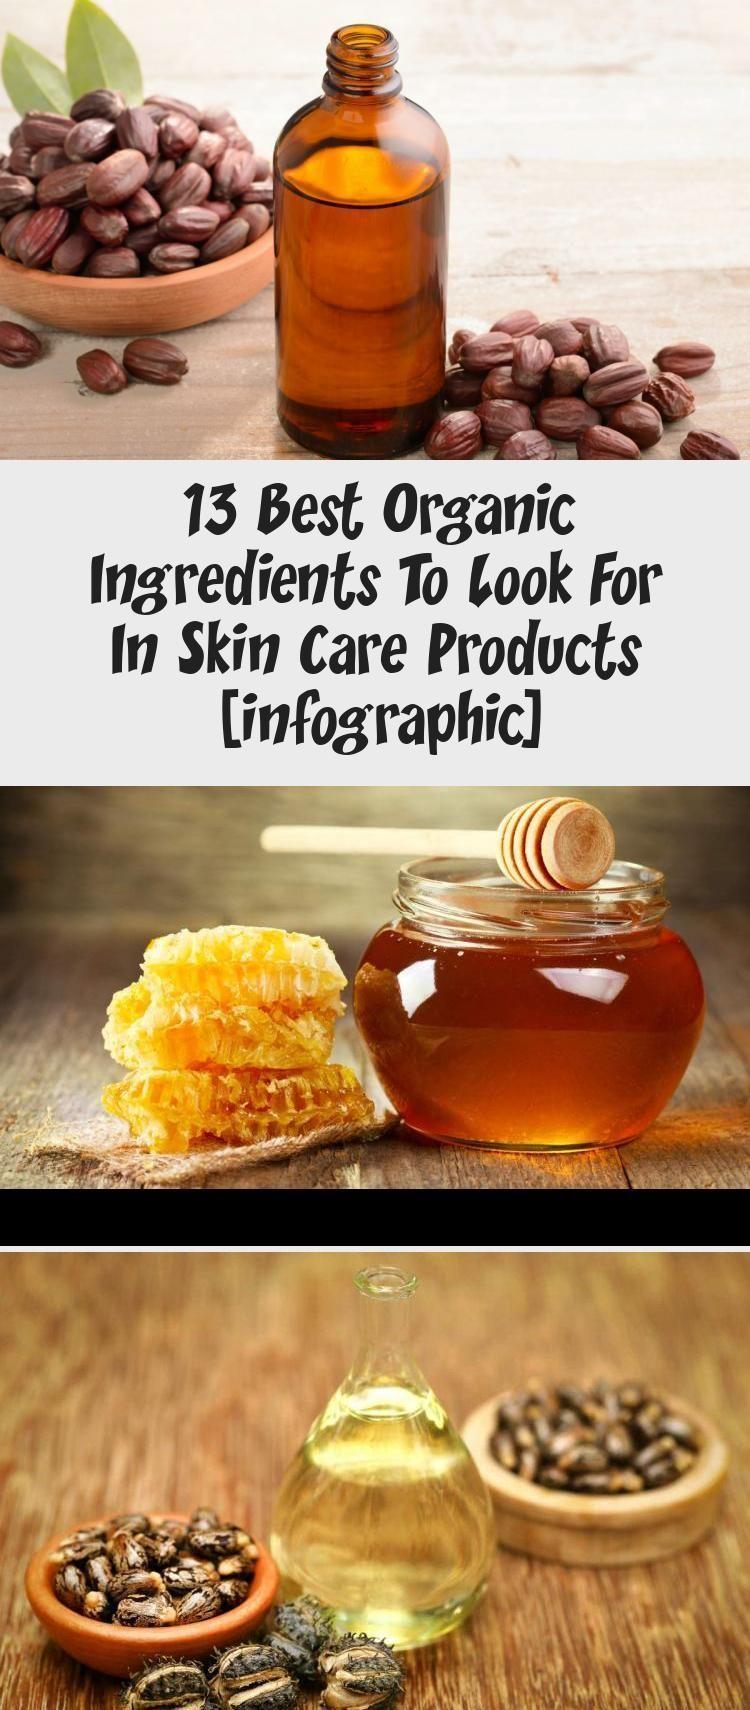 13 Best Organic Ingredients To Look For In Skin Care Products Infographic Be Infographic Ingredients Organic Products 13 Best Organic Ingredient En 2020